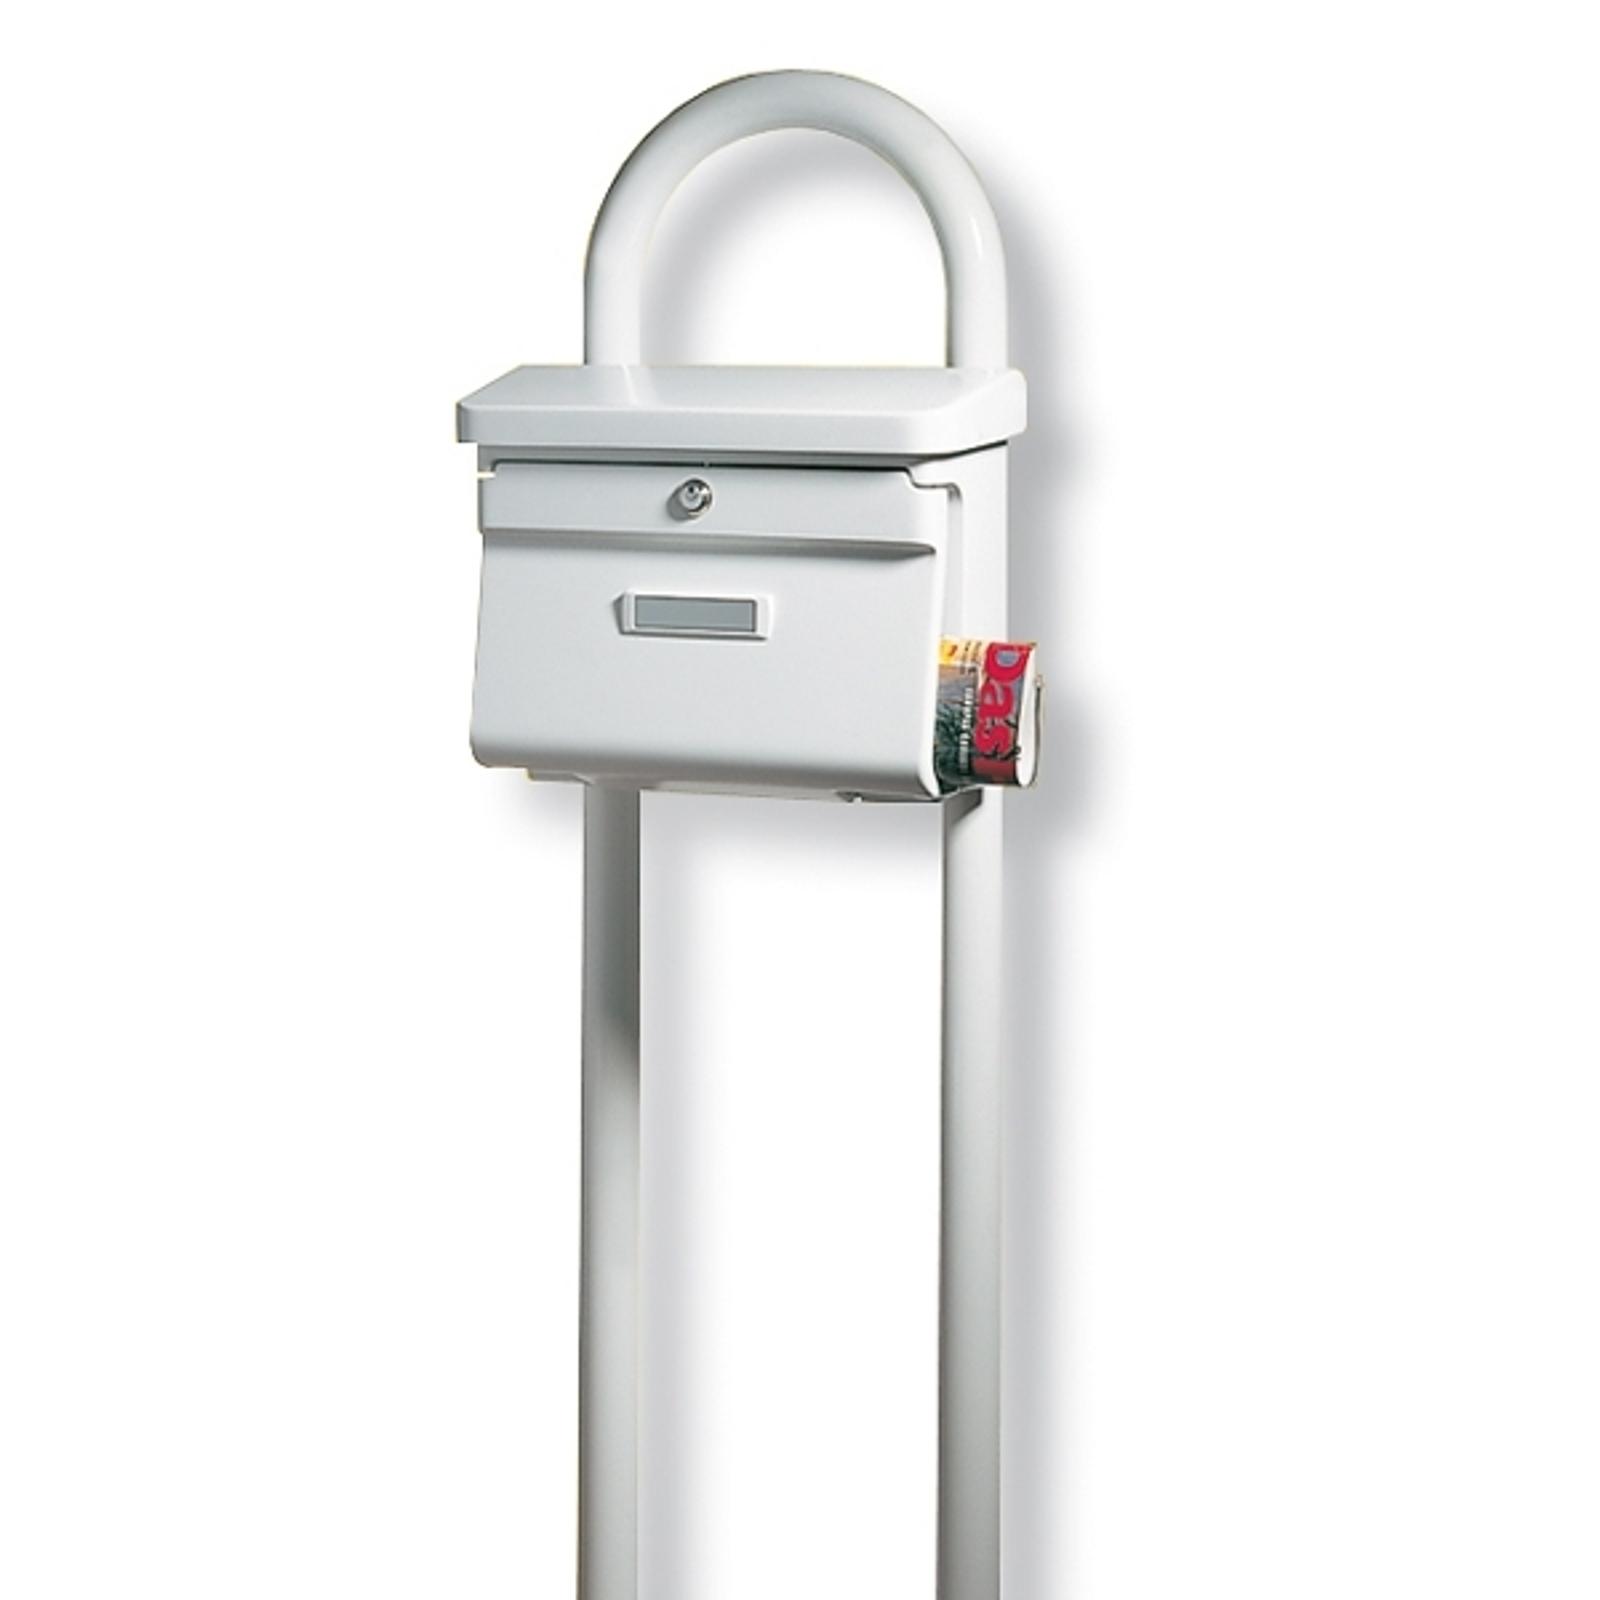 Letter box stand Rondo in white_1532120_1